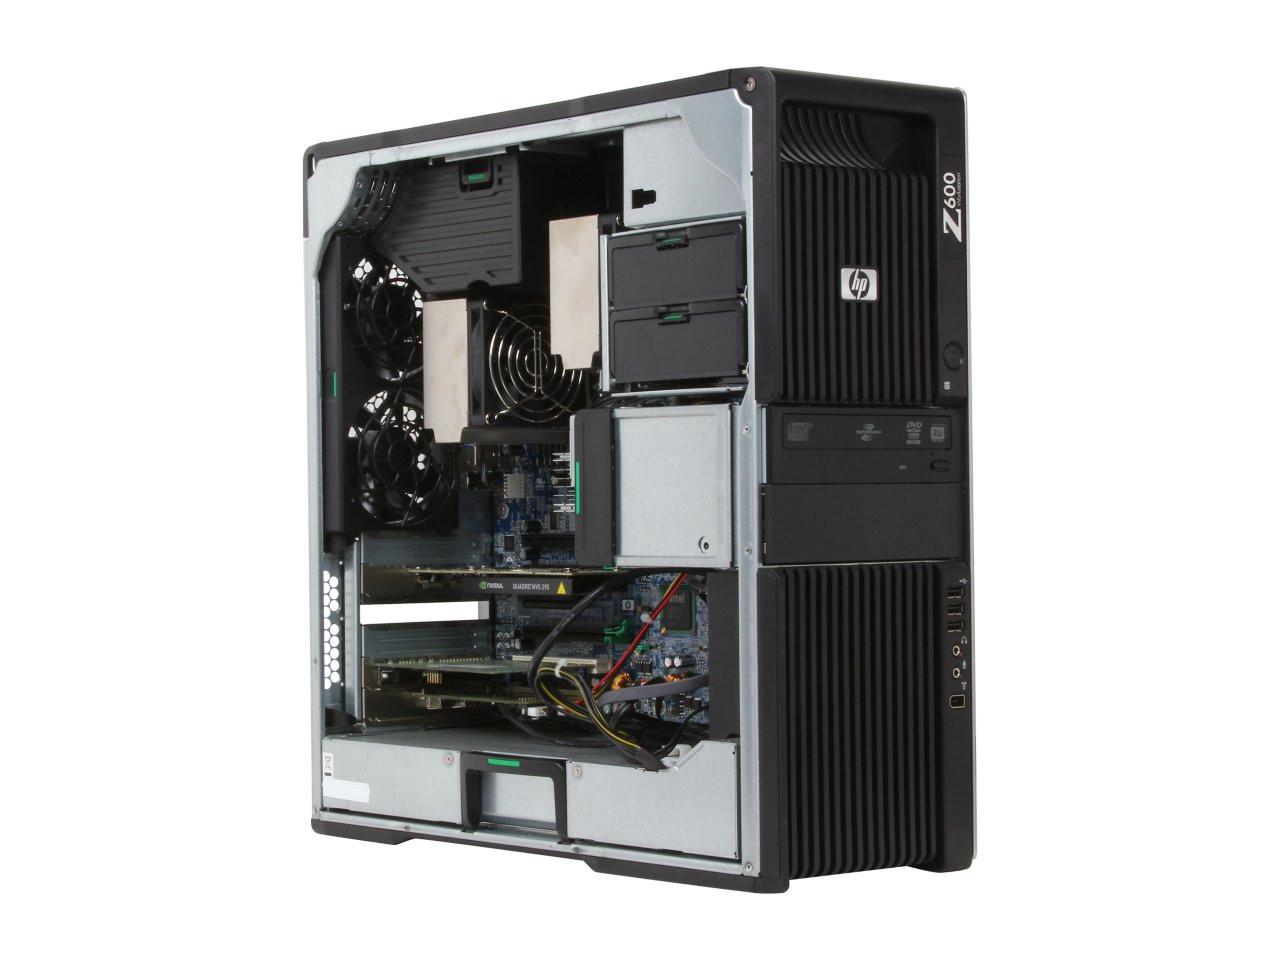 HP Z600 Workstation - inside view